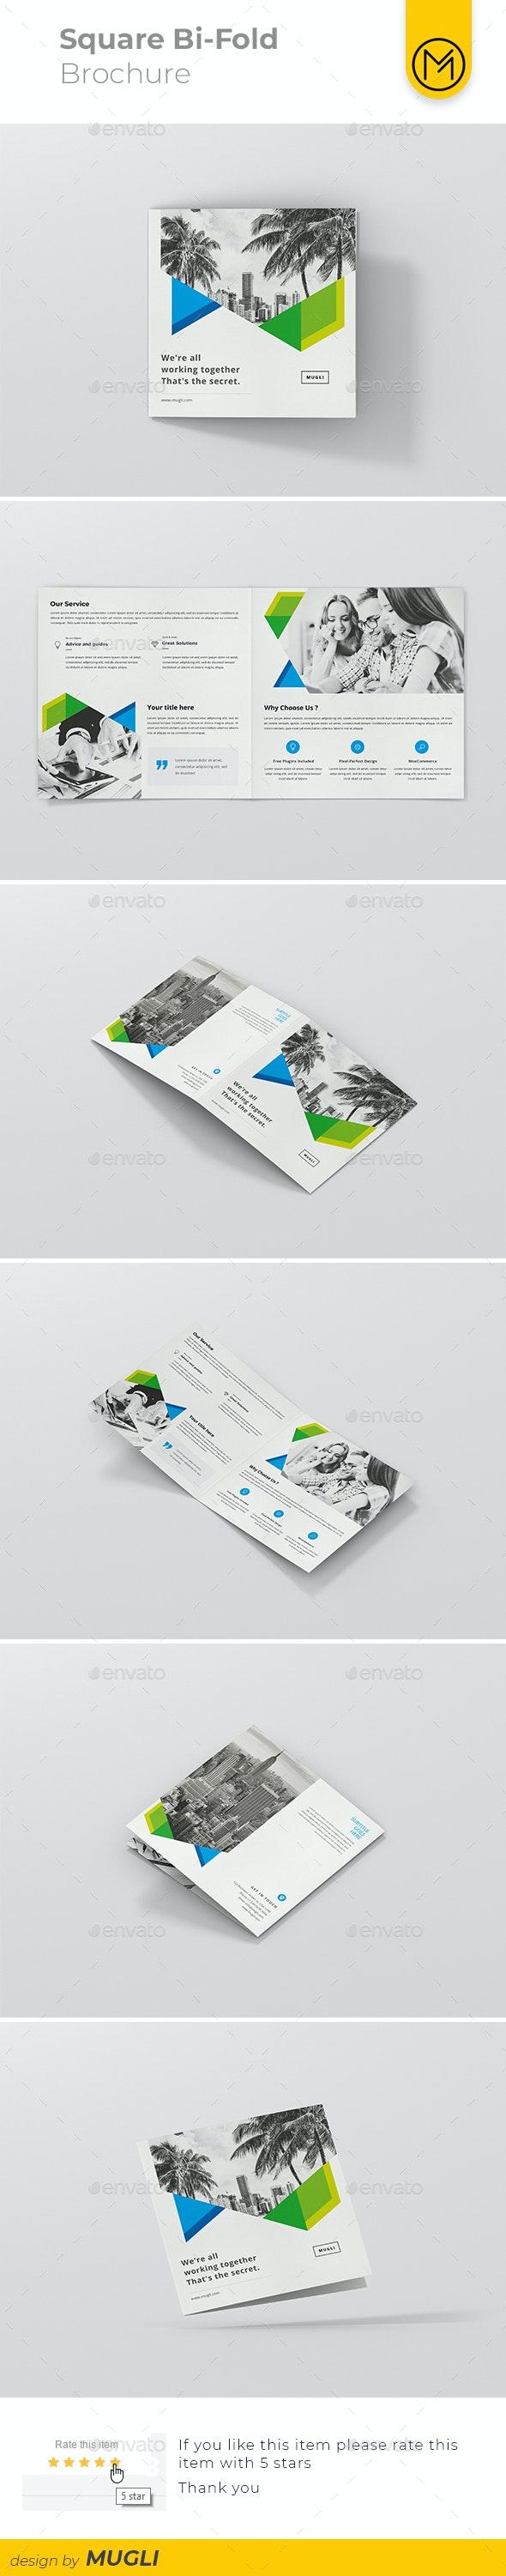 Square Bi-Fold Brochure - Corporate Brochures